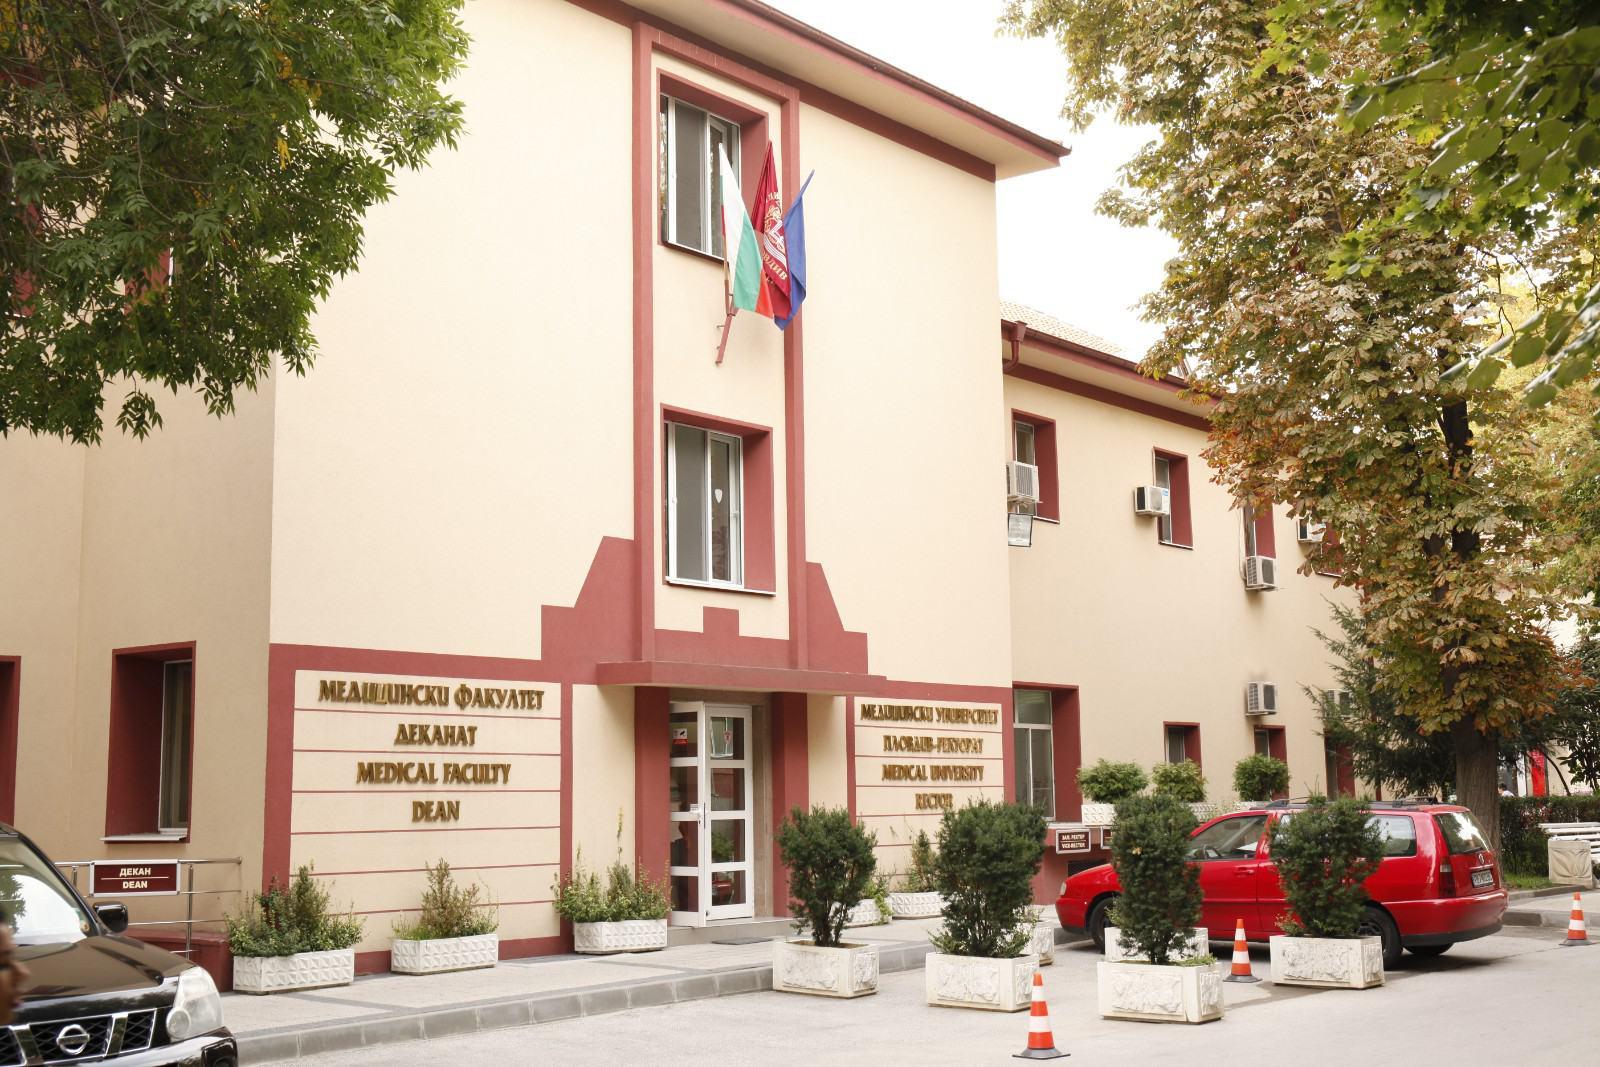 Ректорат на Медицински университет - Пловдив, бул. Васил Априлов №15А